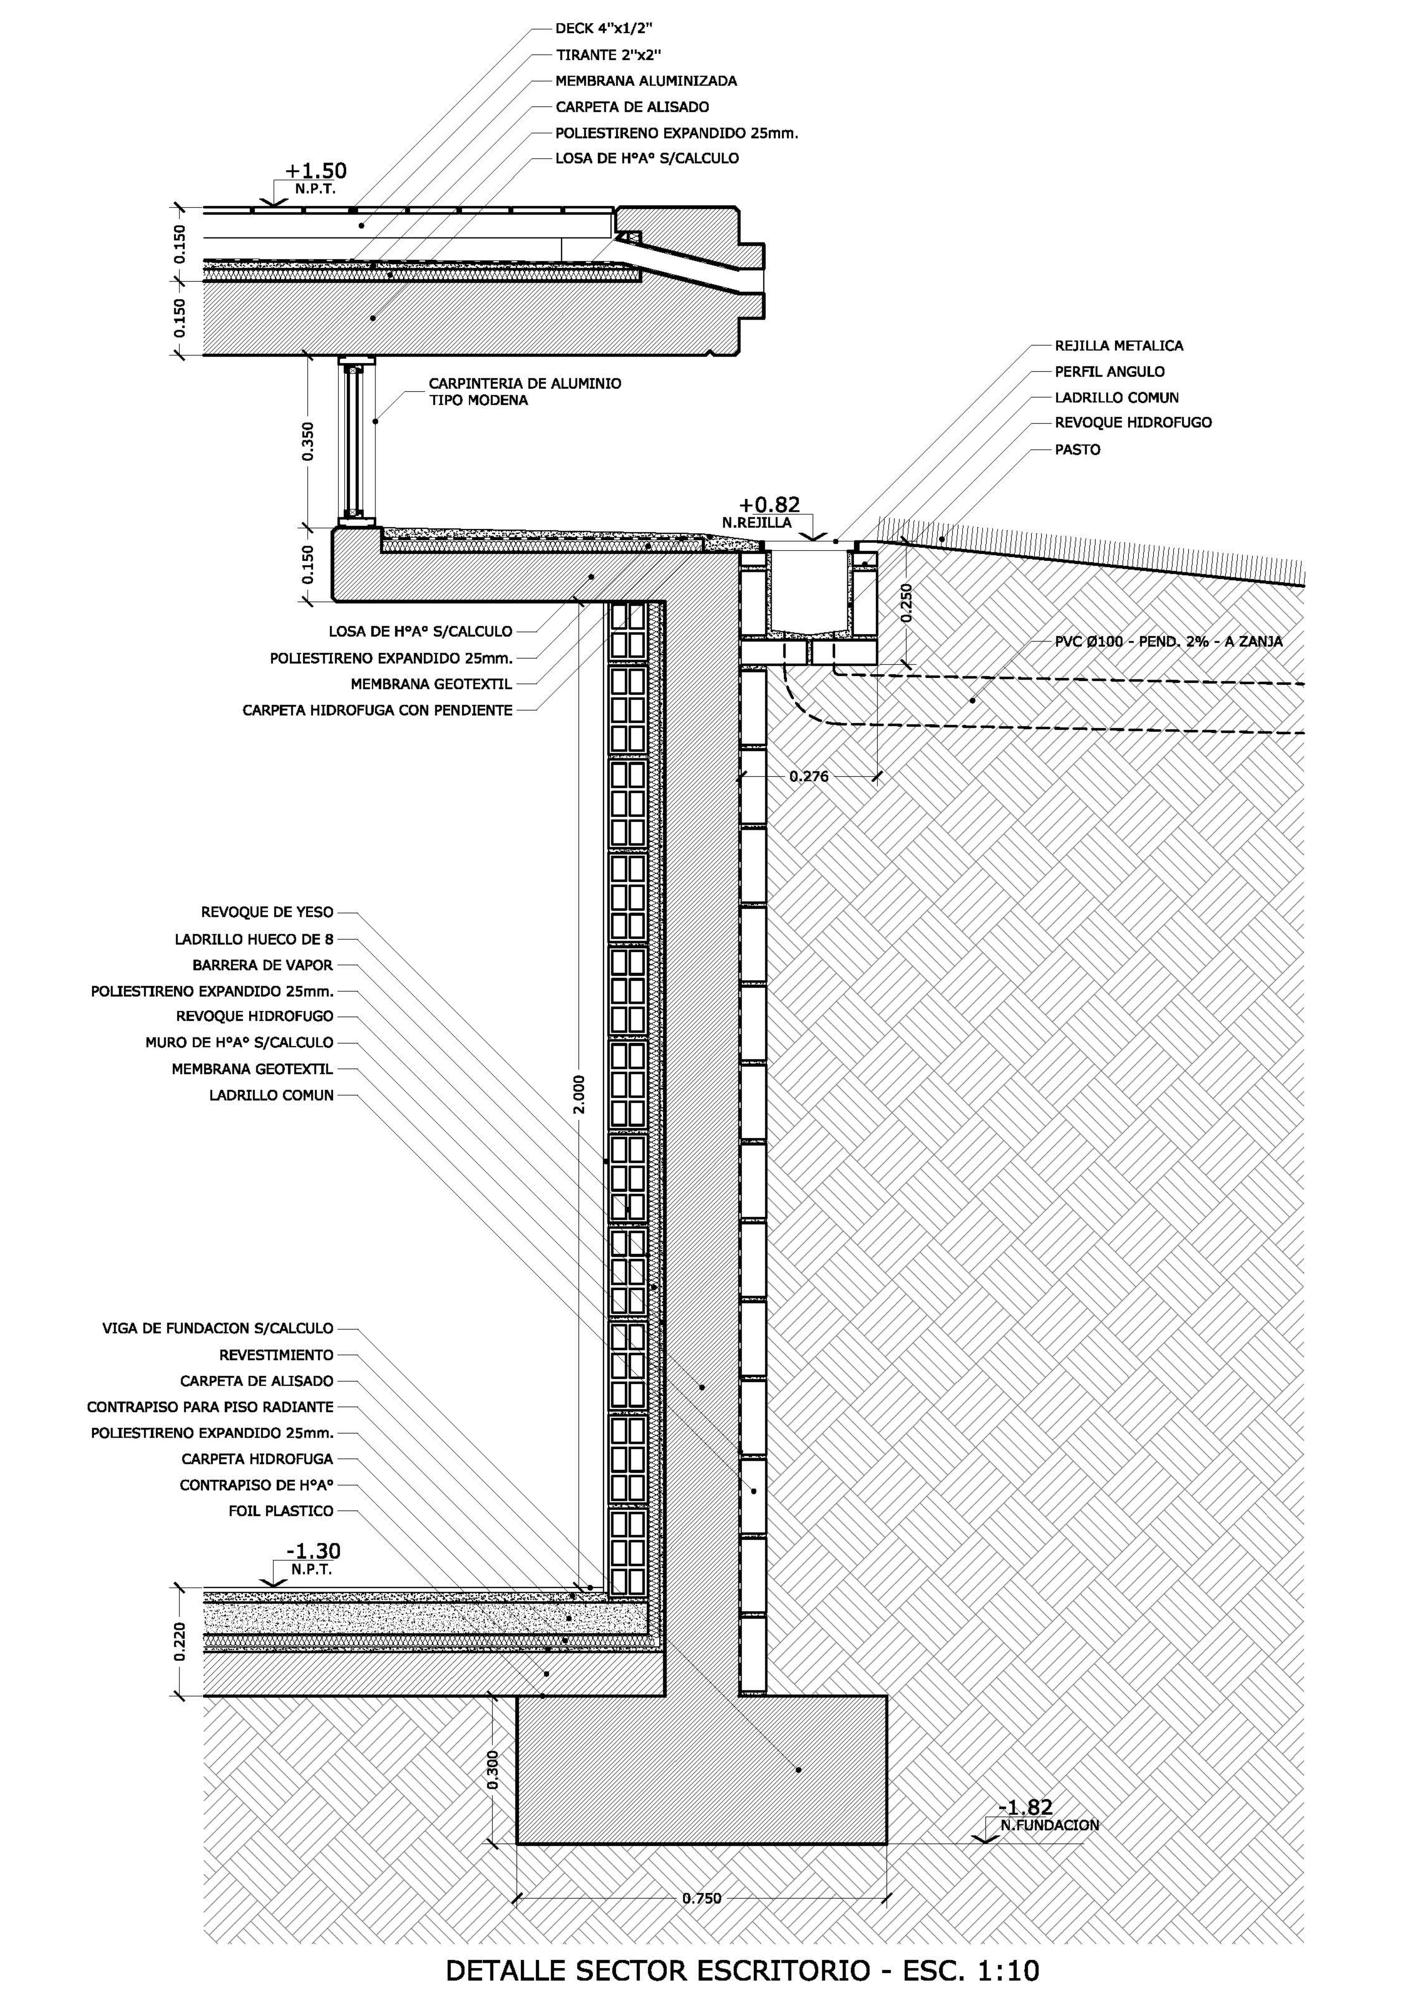 Galer a de casa c u b a mzm arquitectos 19 for Detalles constructivos de piscinas